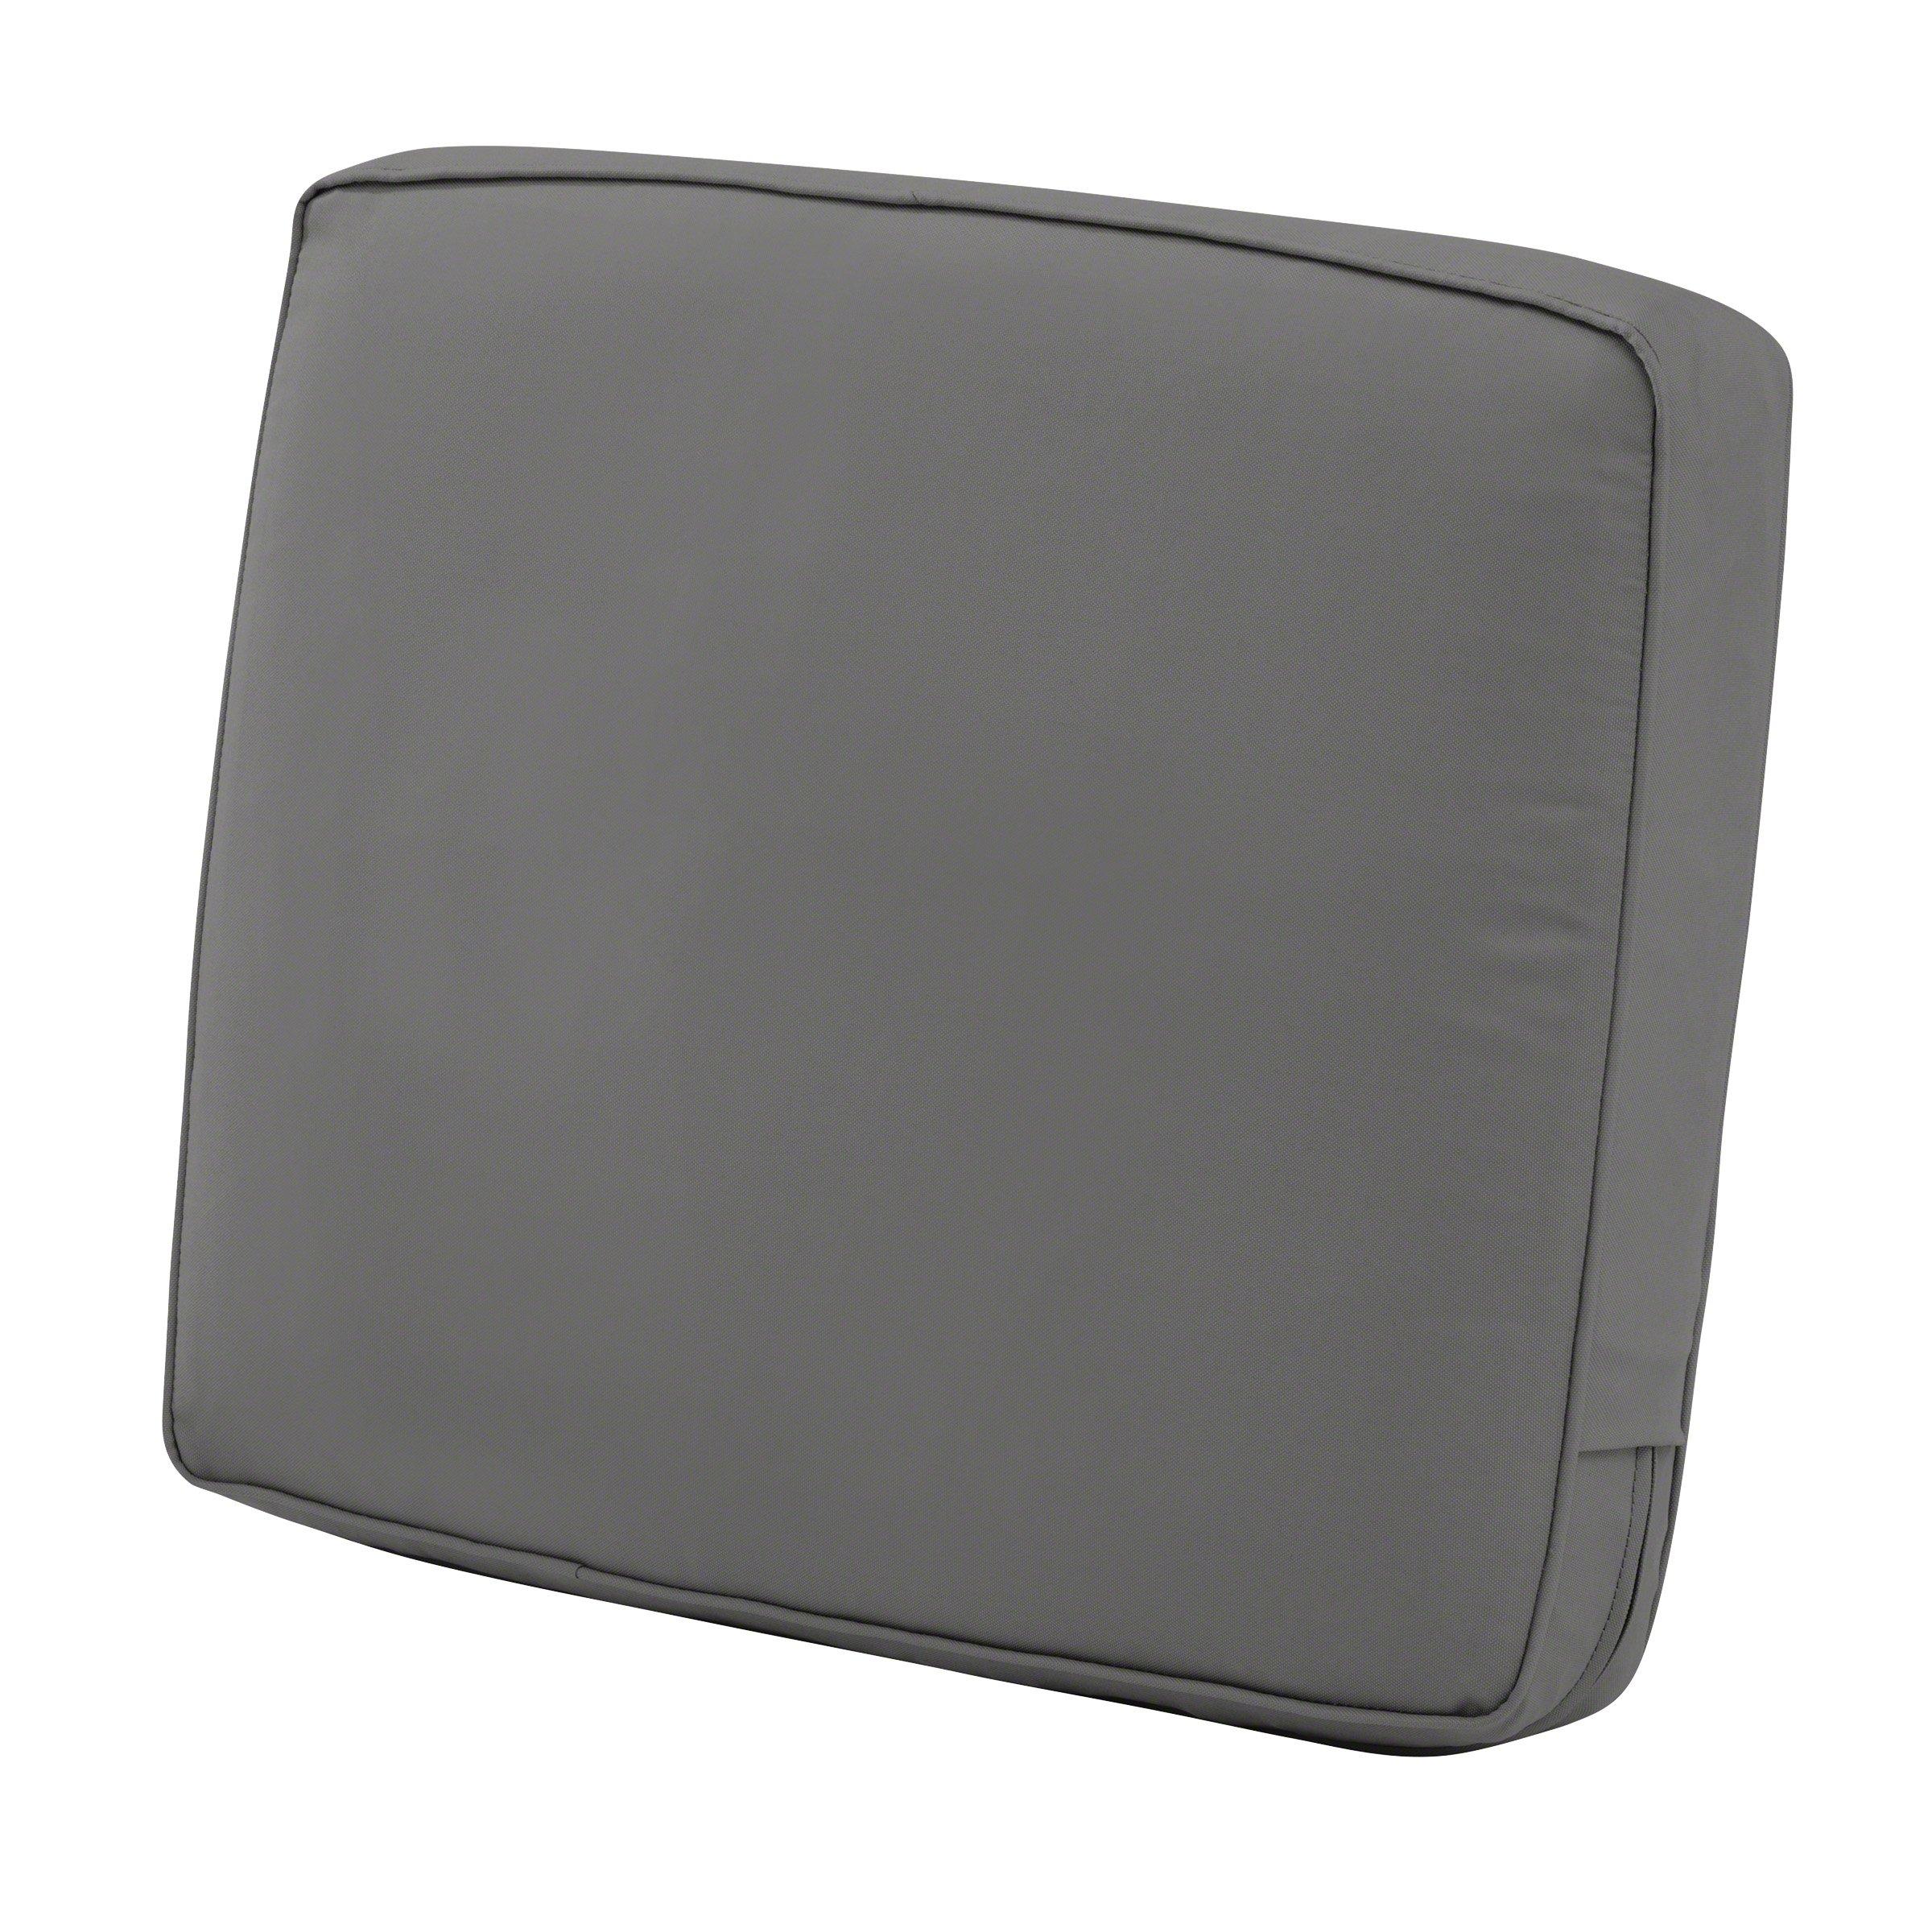 Classic Accessories Montlake Back Cushion Foam & Slip Cover, Light Charcoal, 23x20x4 Thick